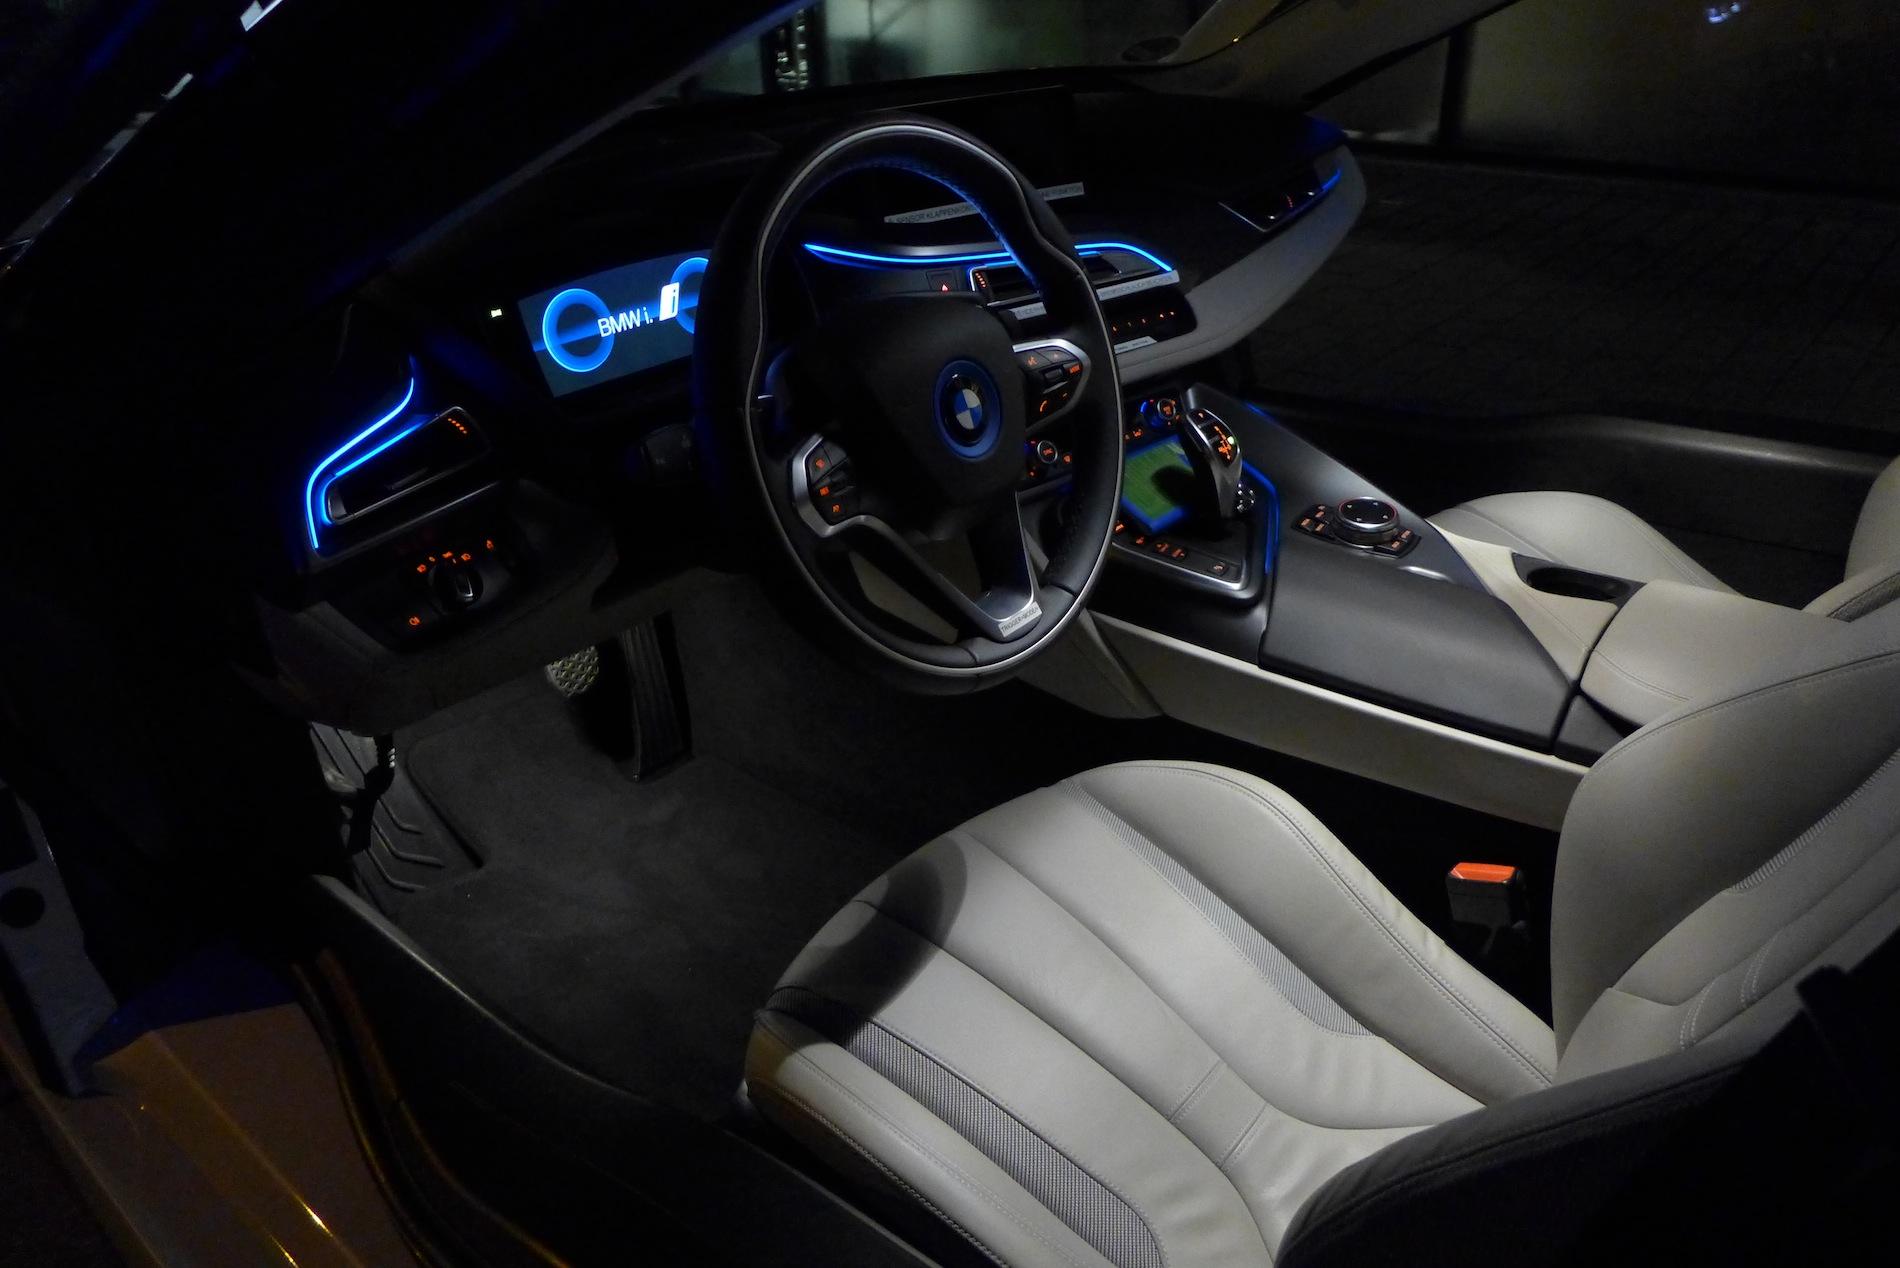 Photo Gallery: BMW i8 Interior at Night - autoevolution